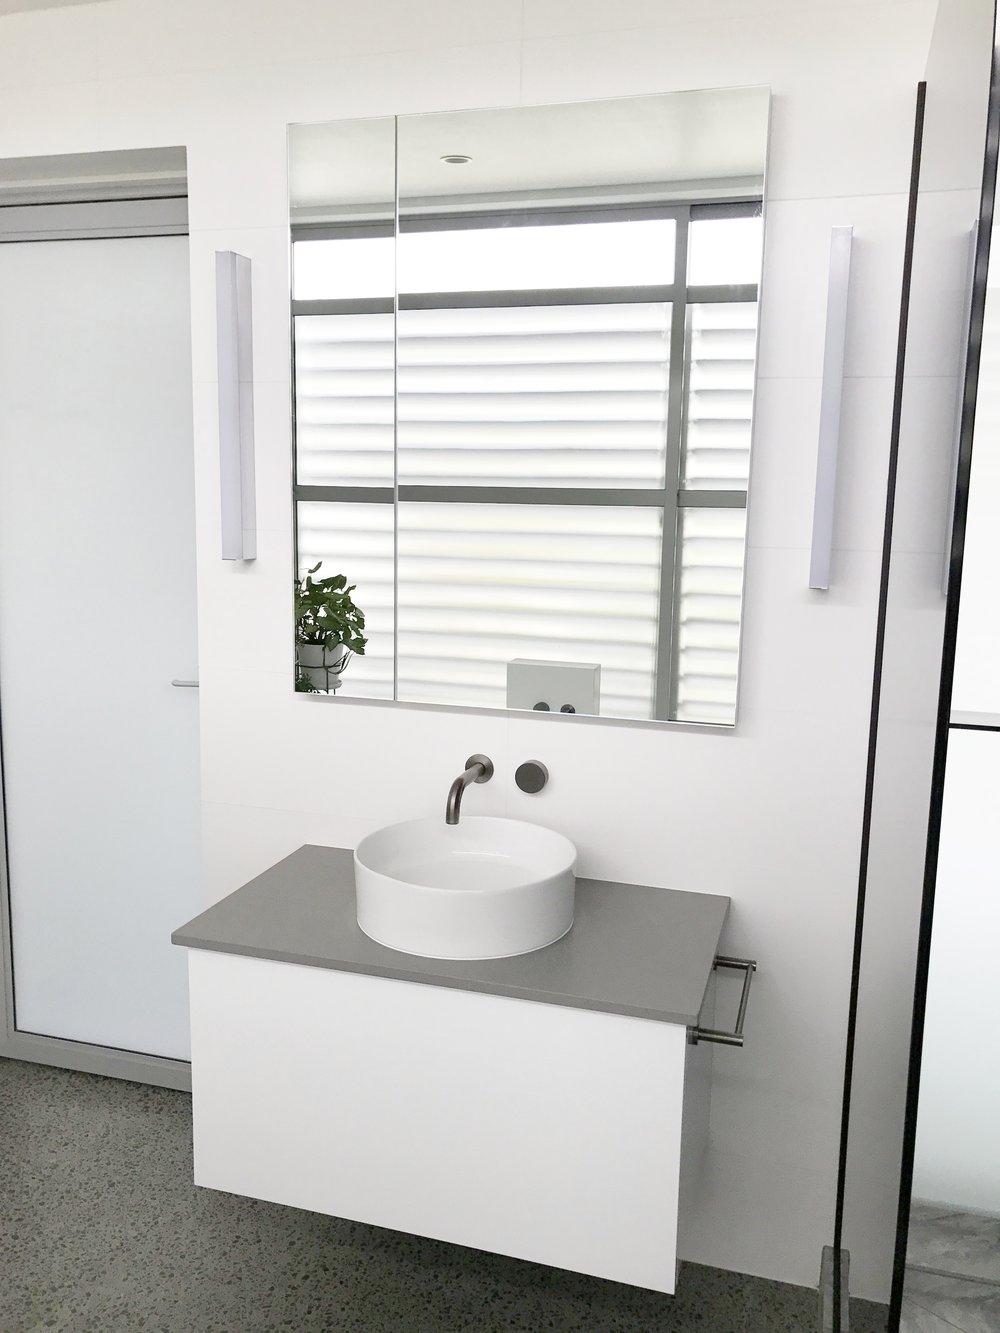 Sleek sink with a wide mirror